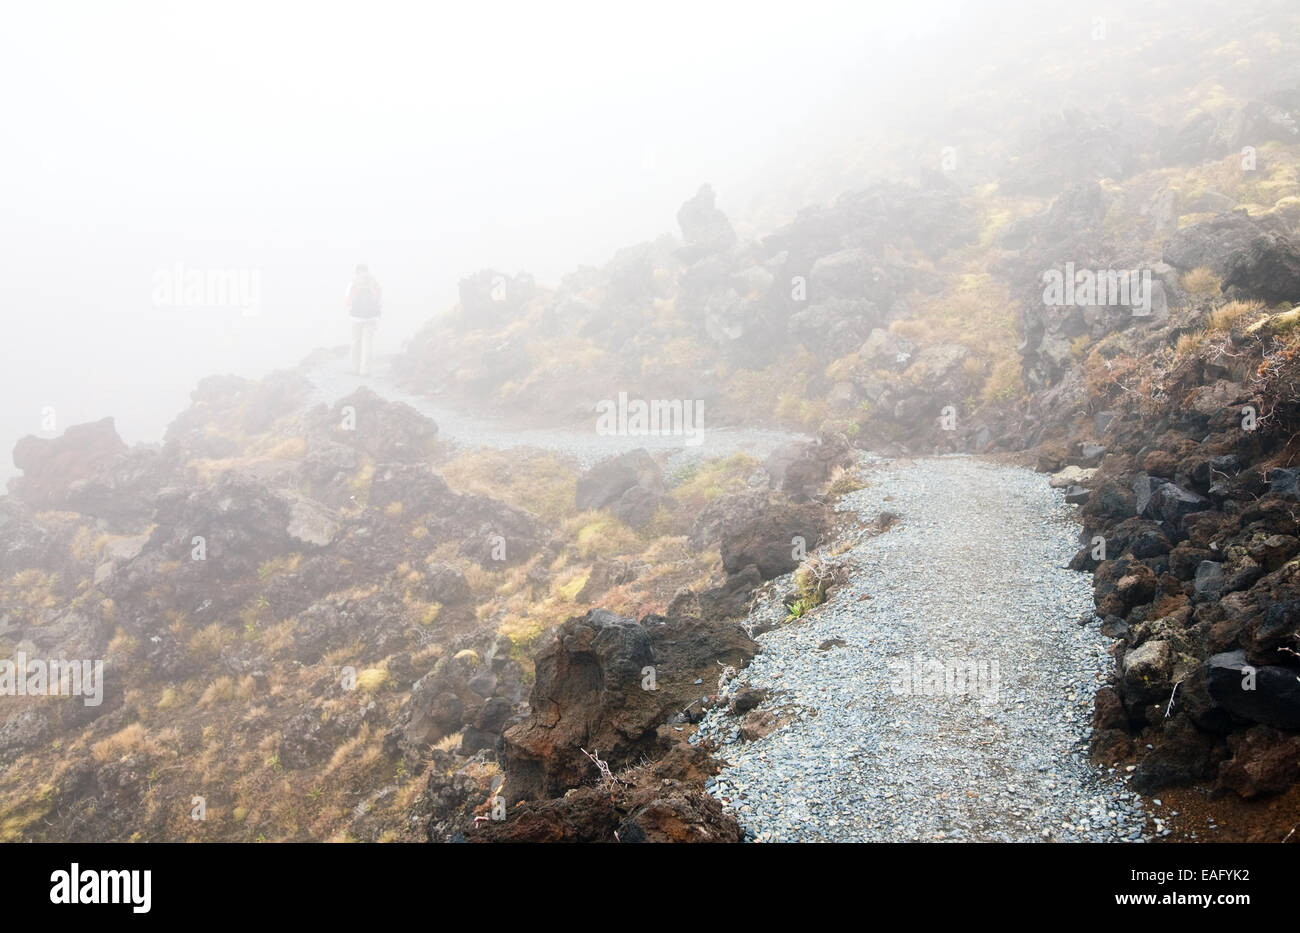 Hiker walking on public track at Tongariro National Park, New Zealand - Stock Image